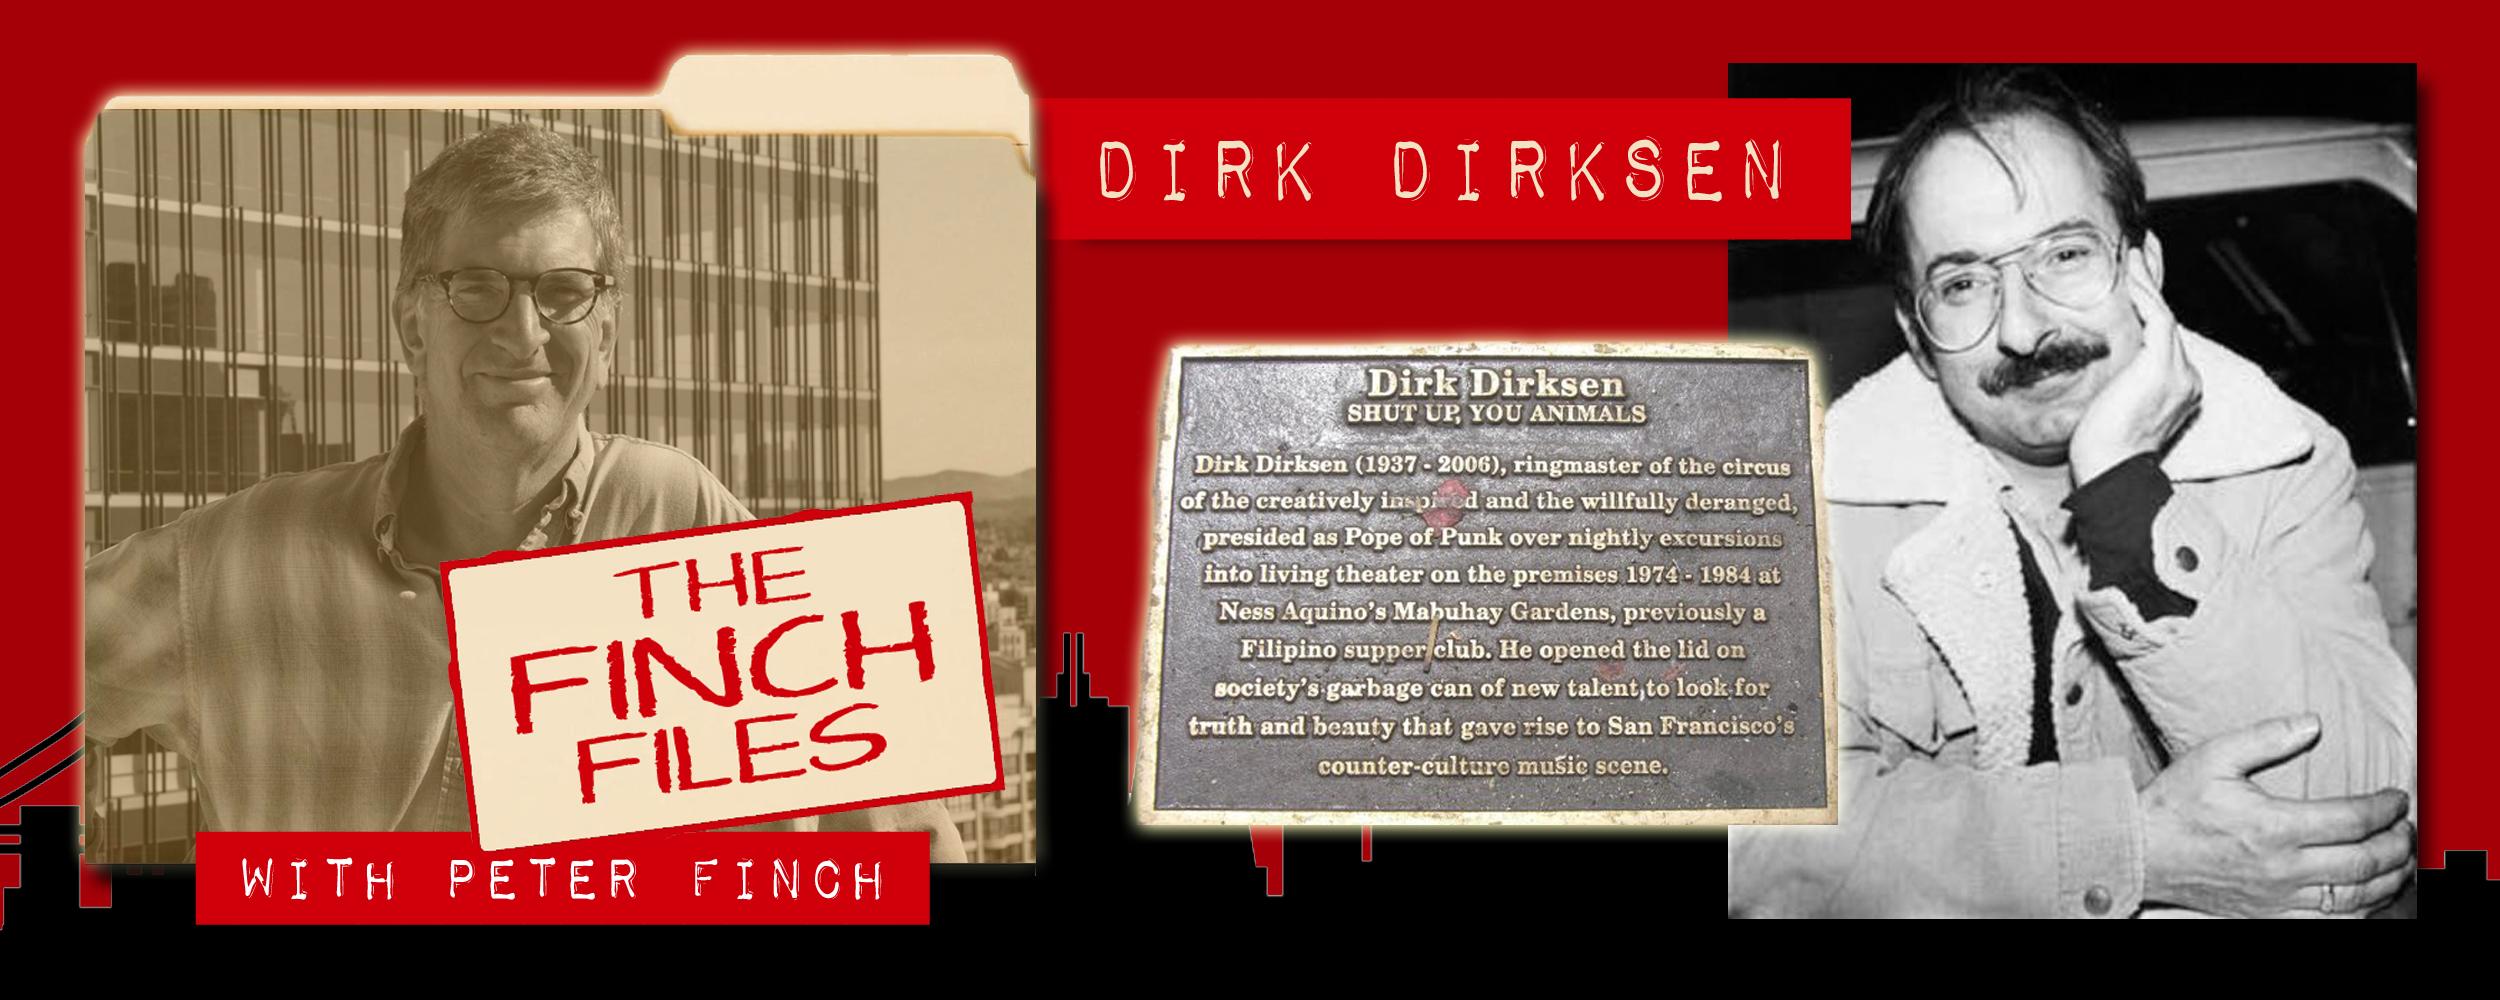 The Finch Files: Dirk Dirksen